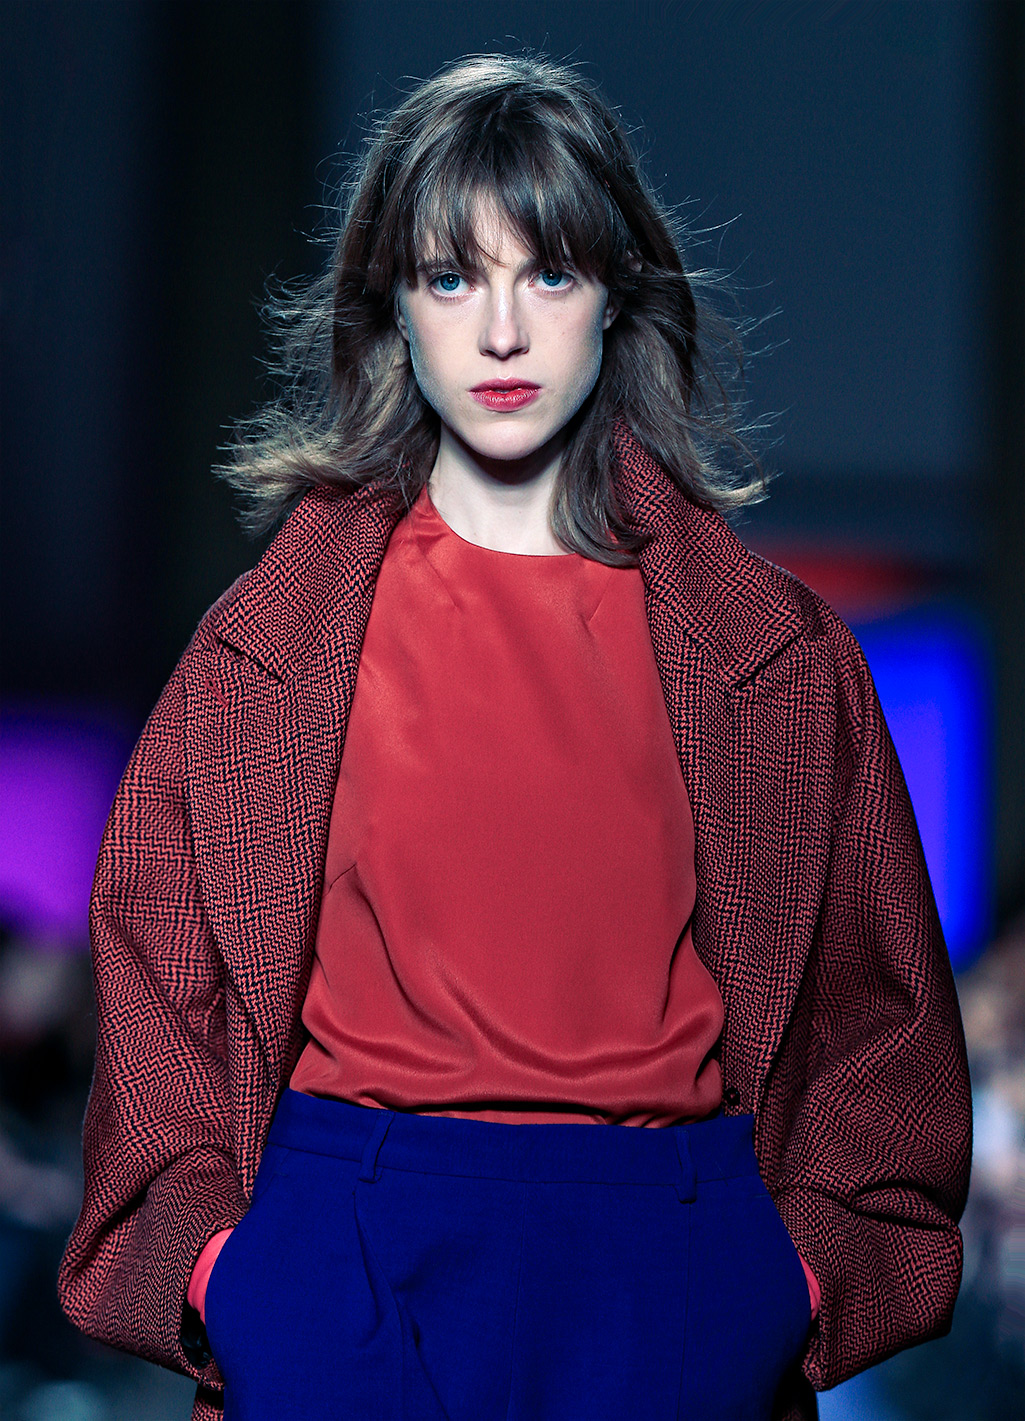 Paul Smith fashionweek London